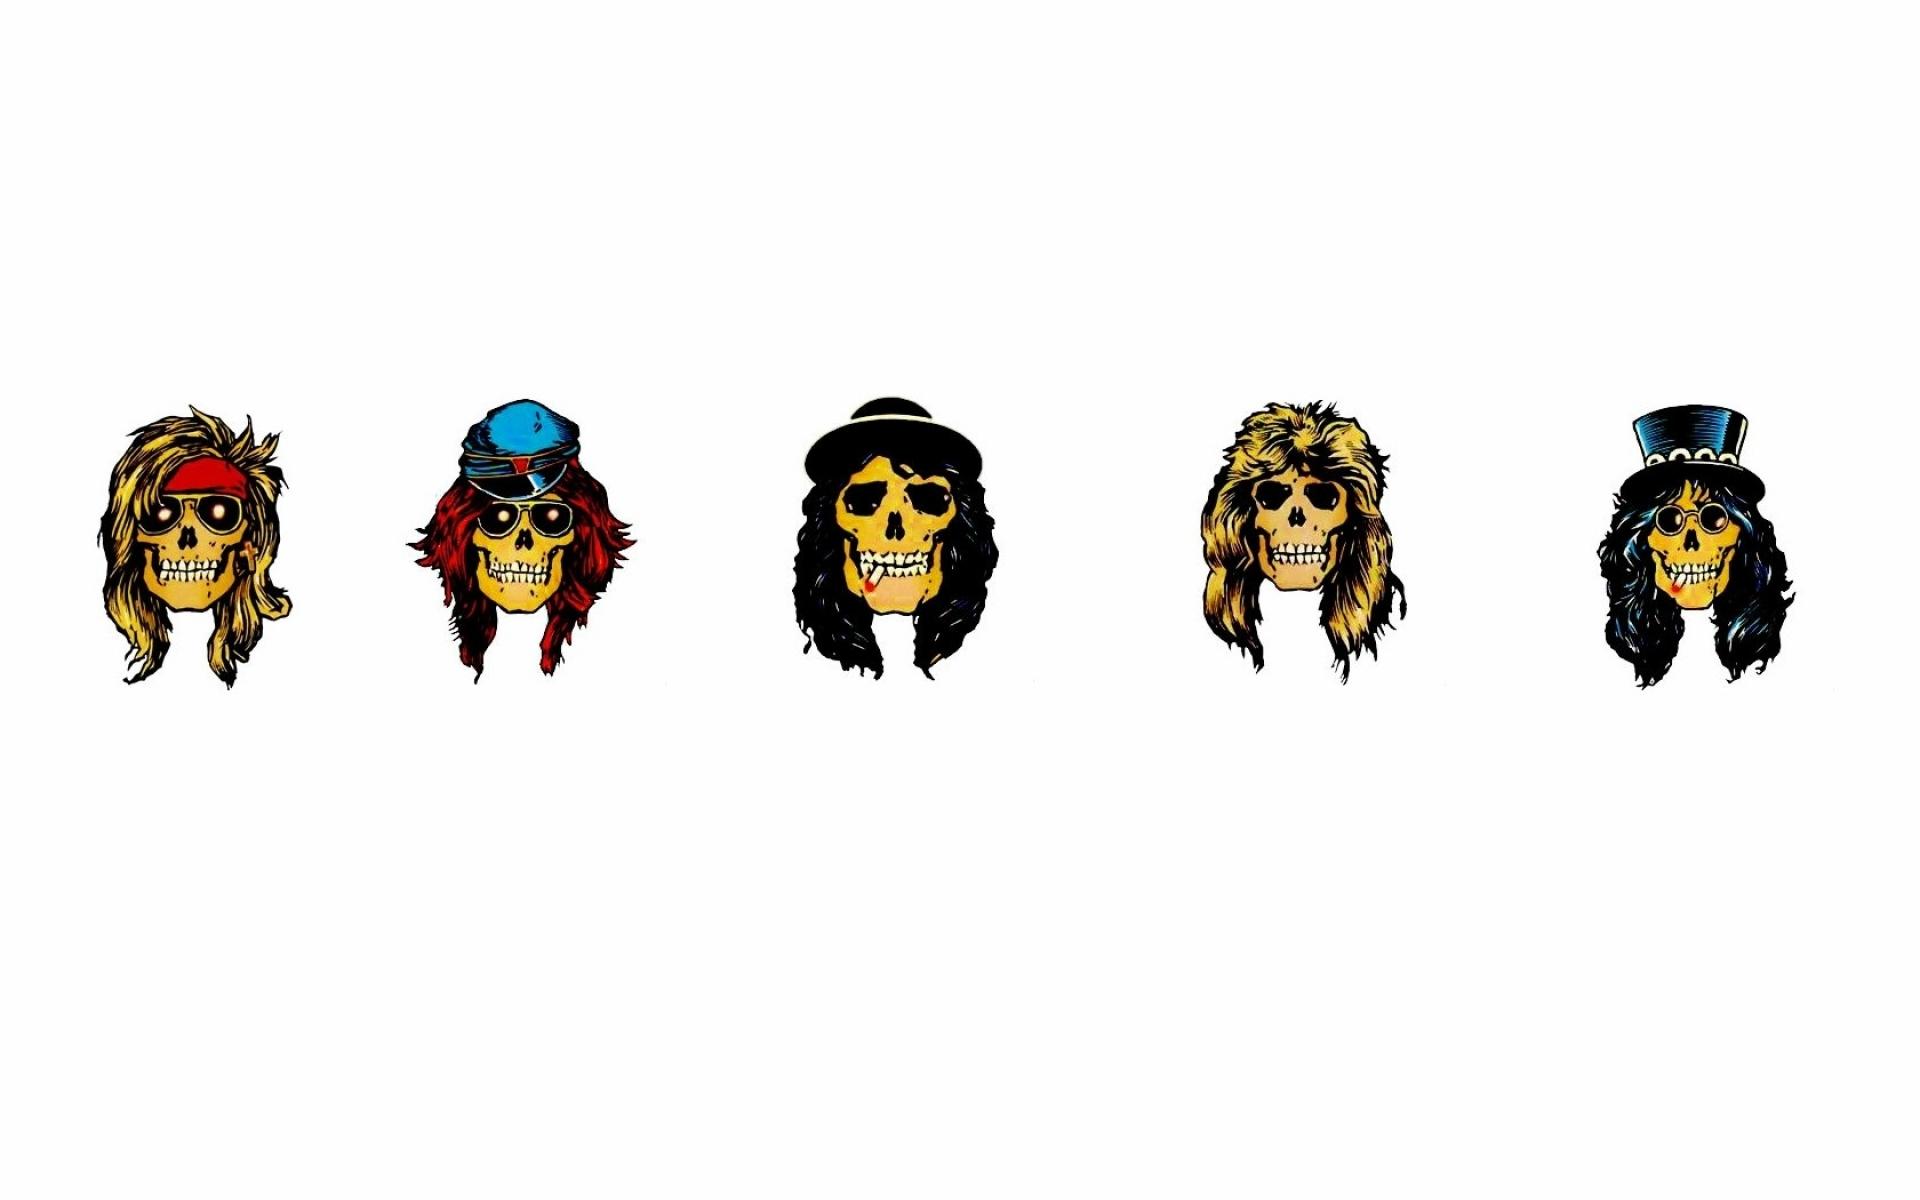 Guns N Roses heavy metal hard rock bands groups album cover logo 1920x1200